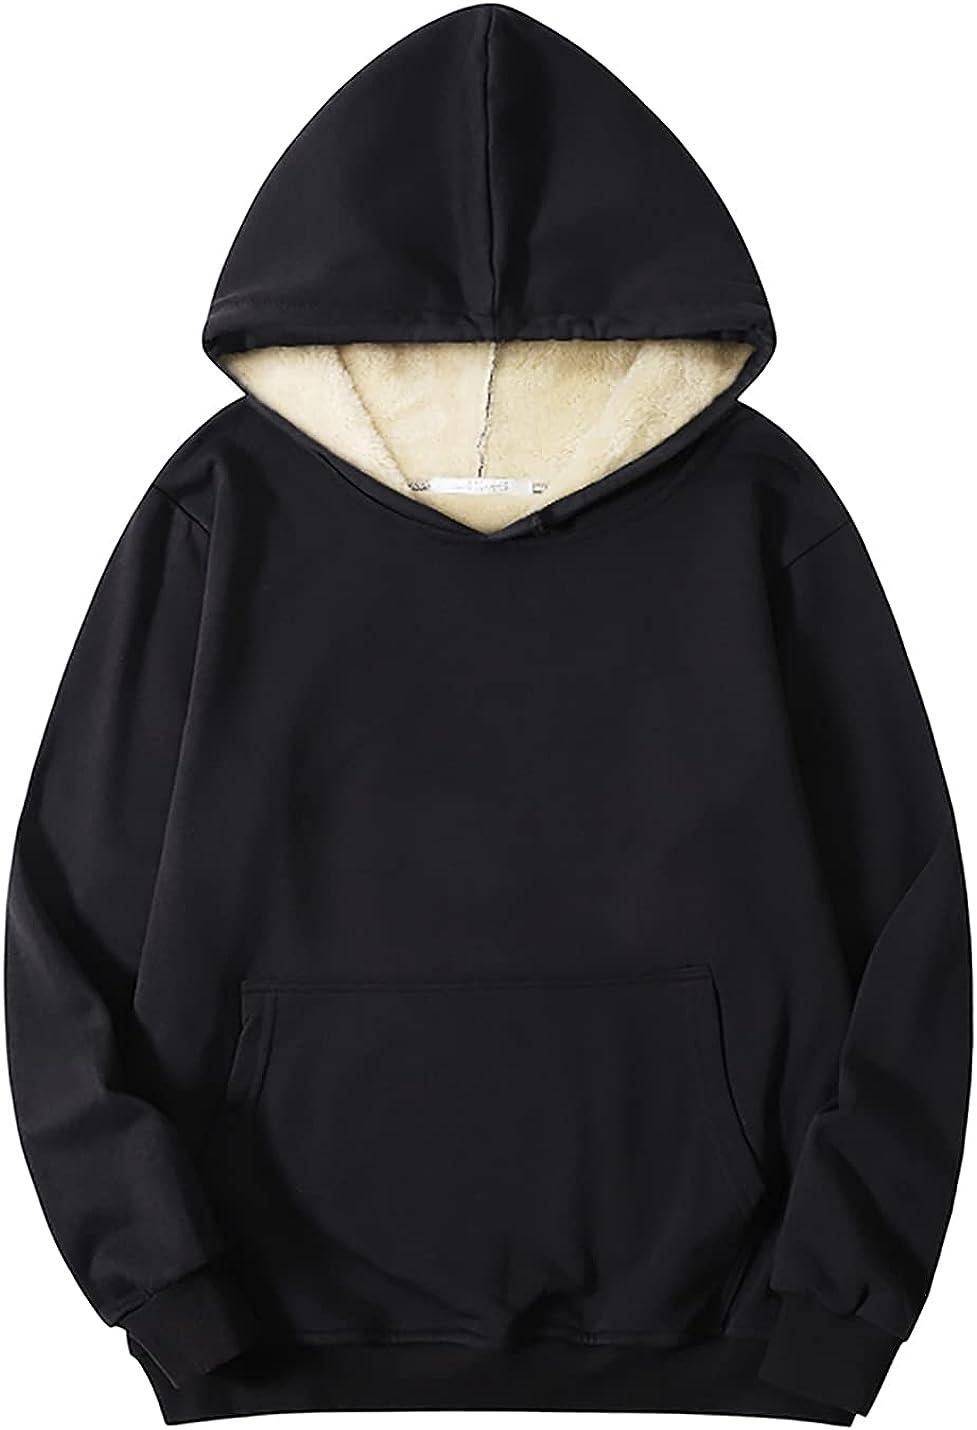 Kissonic Men's Thermal Ranking TOP15 Sherpa Lined Sweatshirt Fleece Ath Charlotte Mall Hoodie